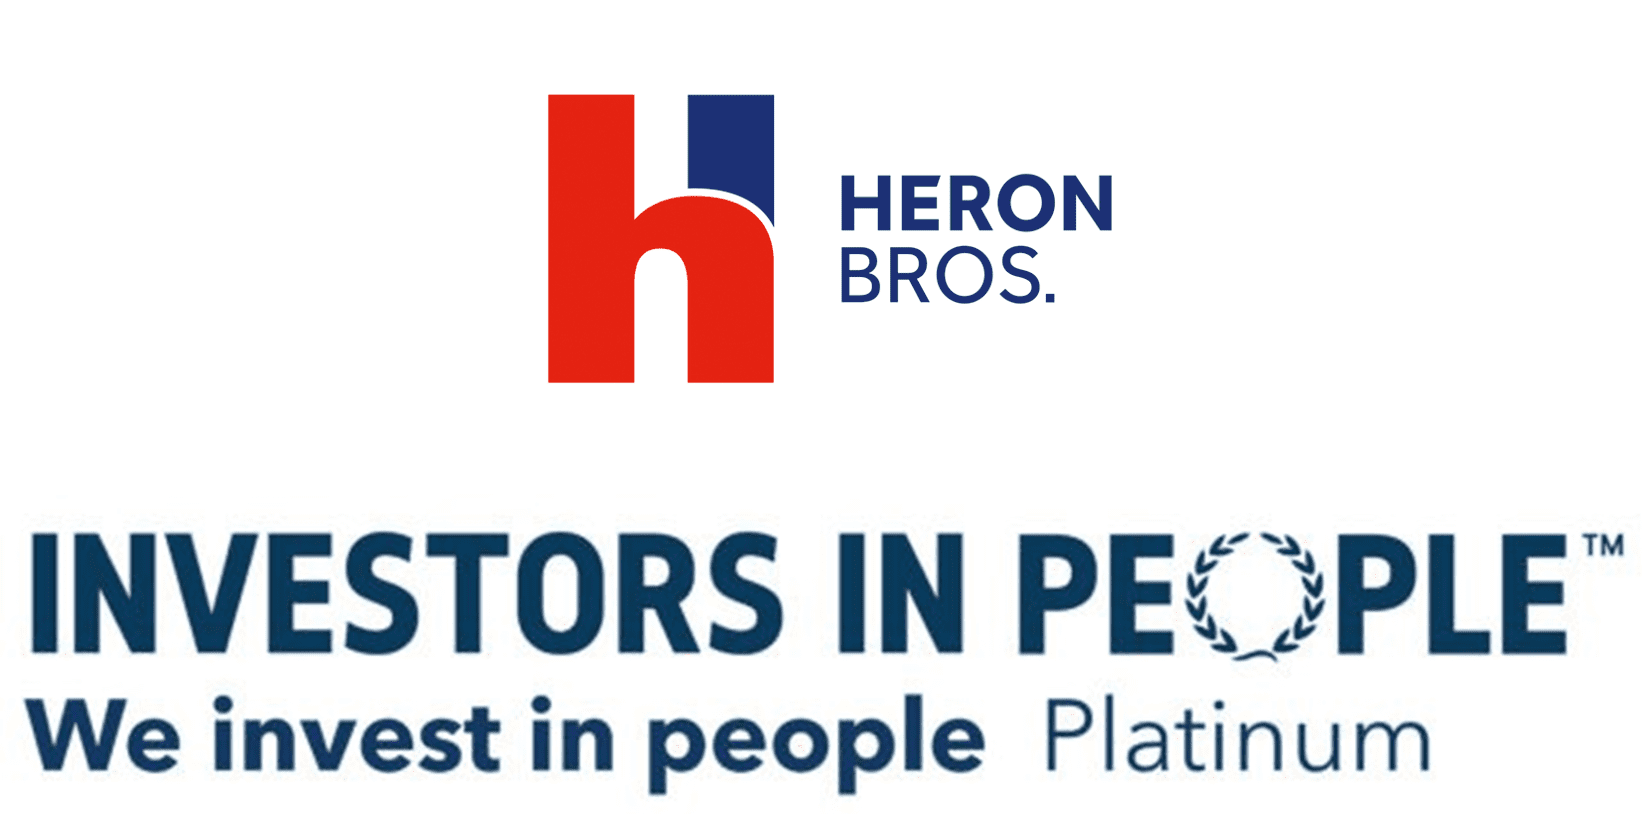 Heron Bros retain Investors in People Platinum re-accreditation